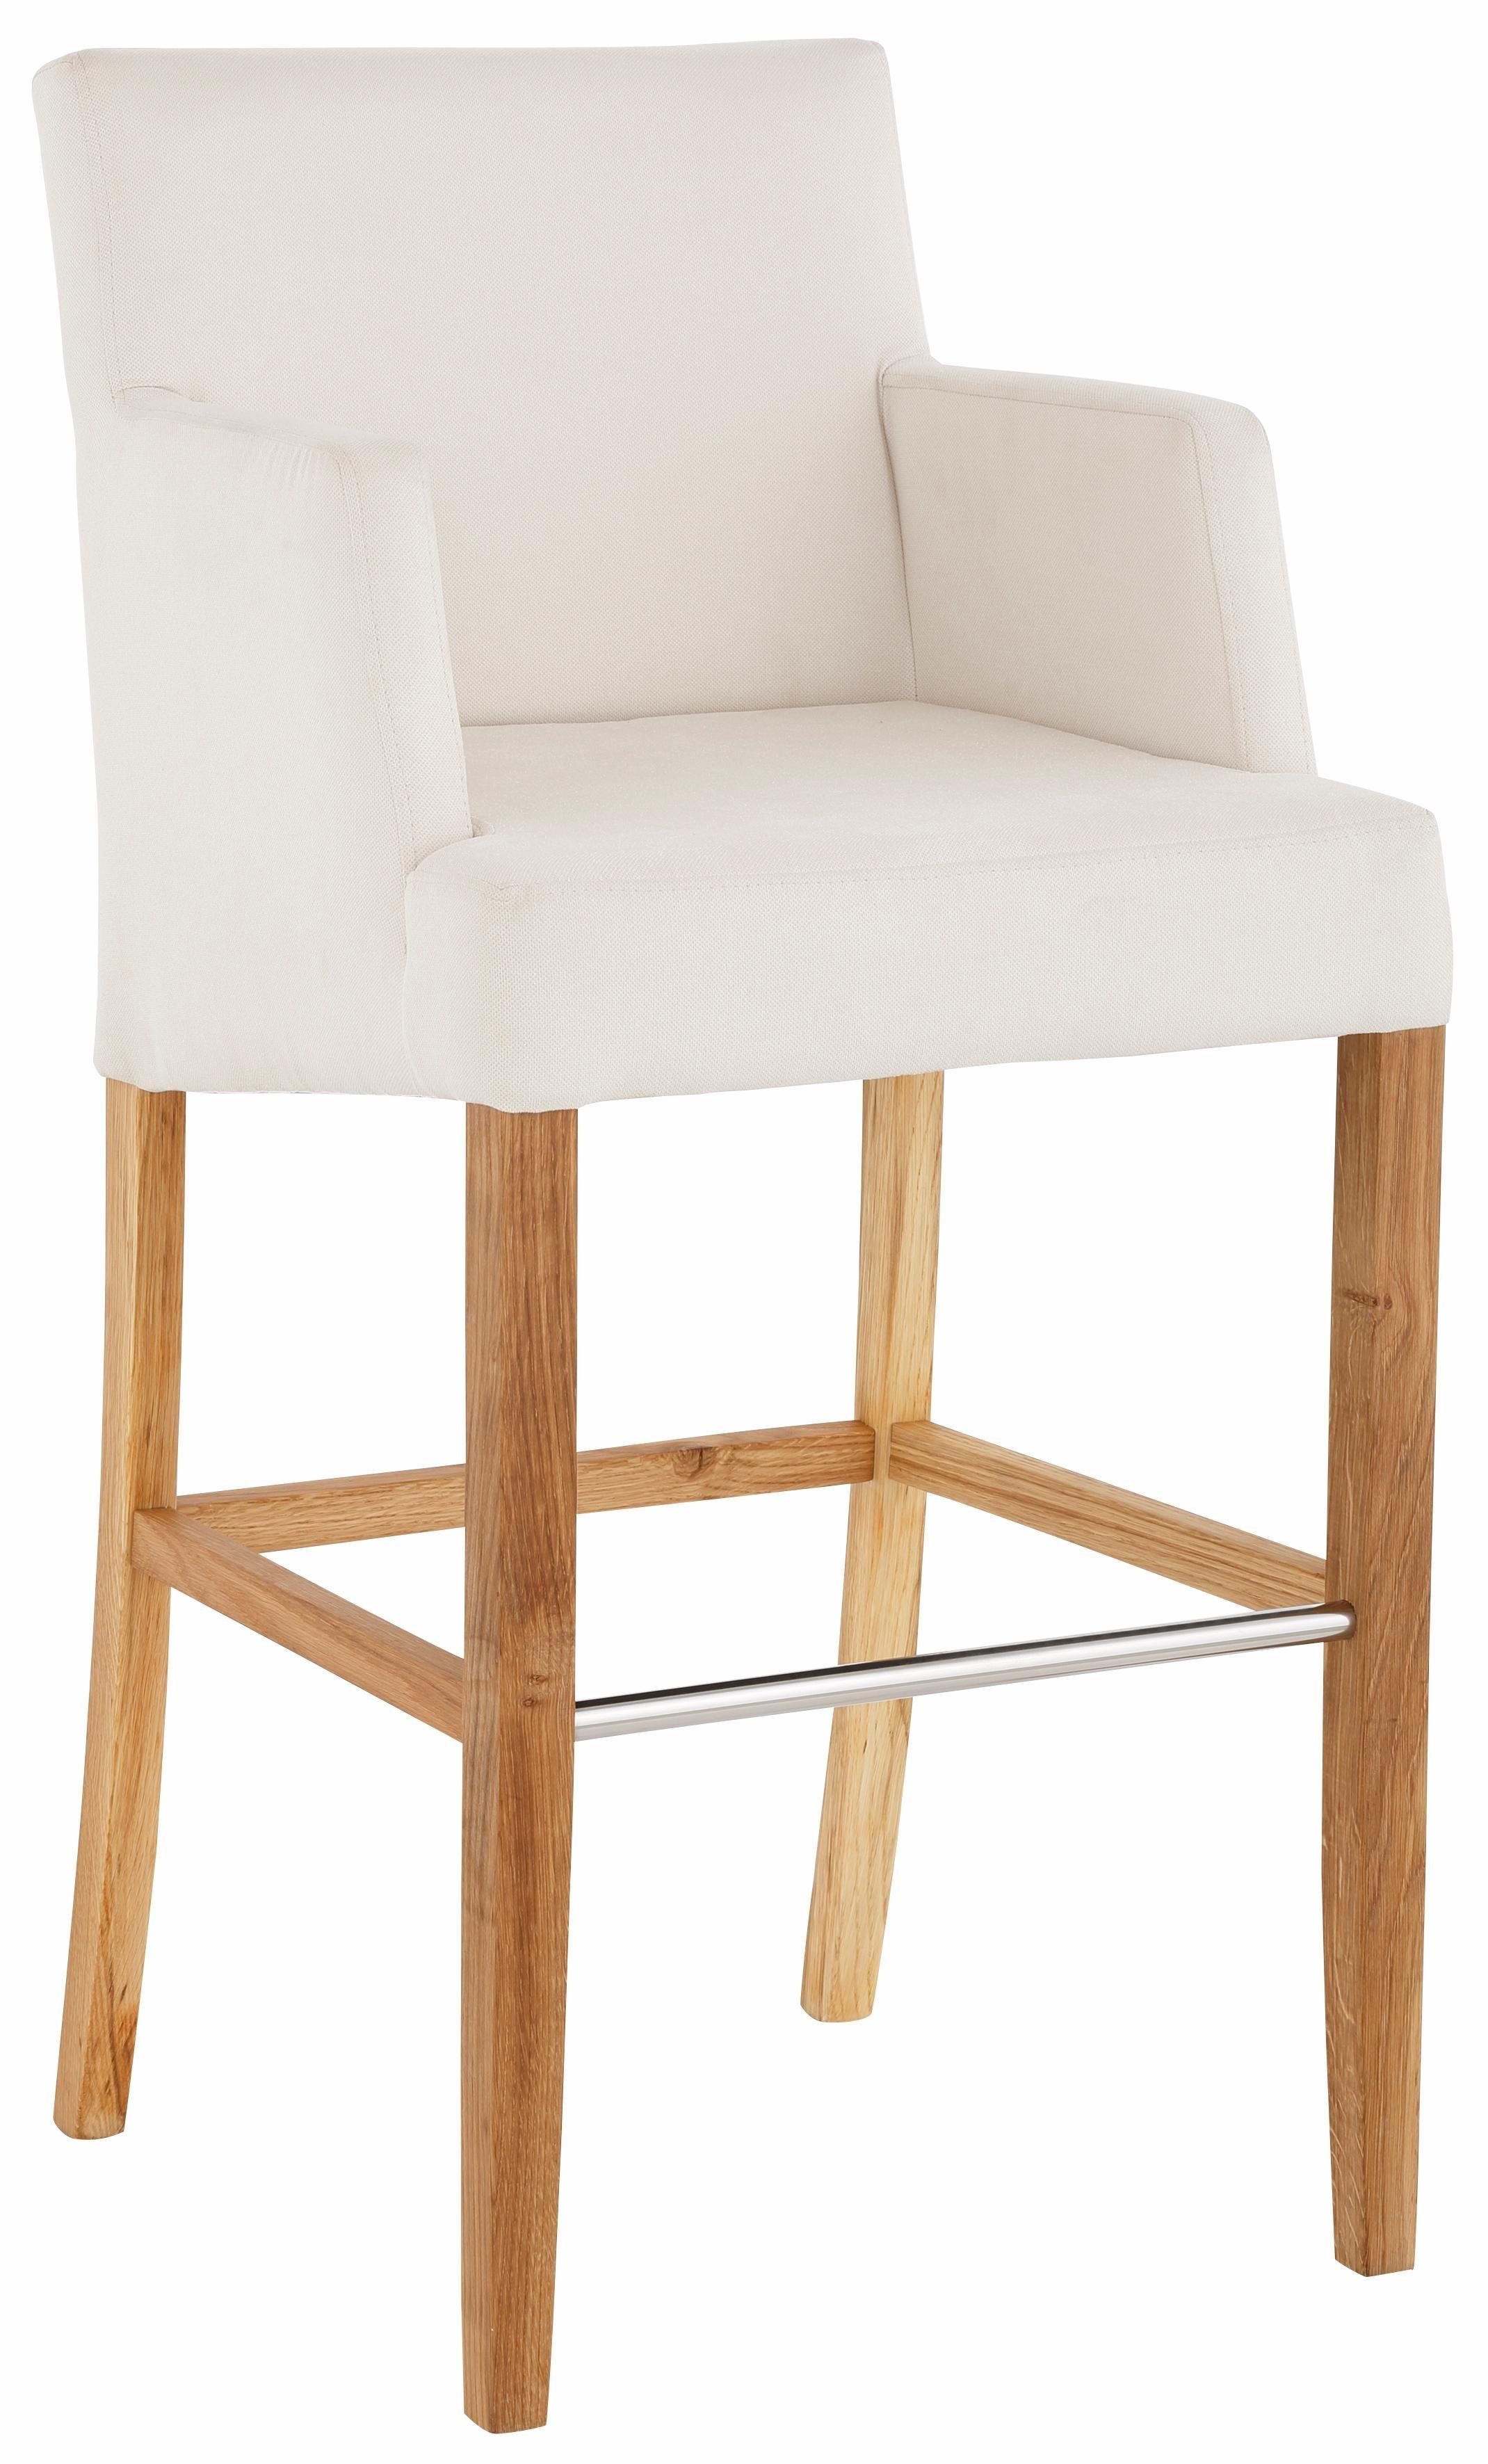 home affaire barkruk esther makkelijk besteld otto. Black Bedroom Furniture Sets. Home Design Ideas